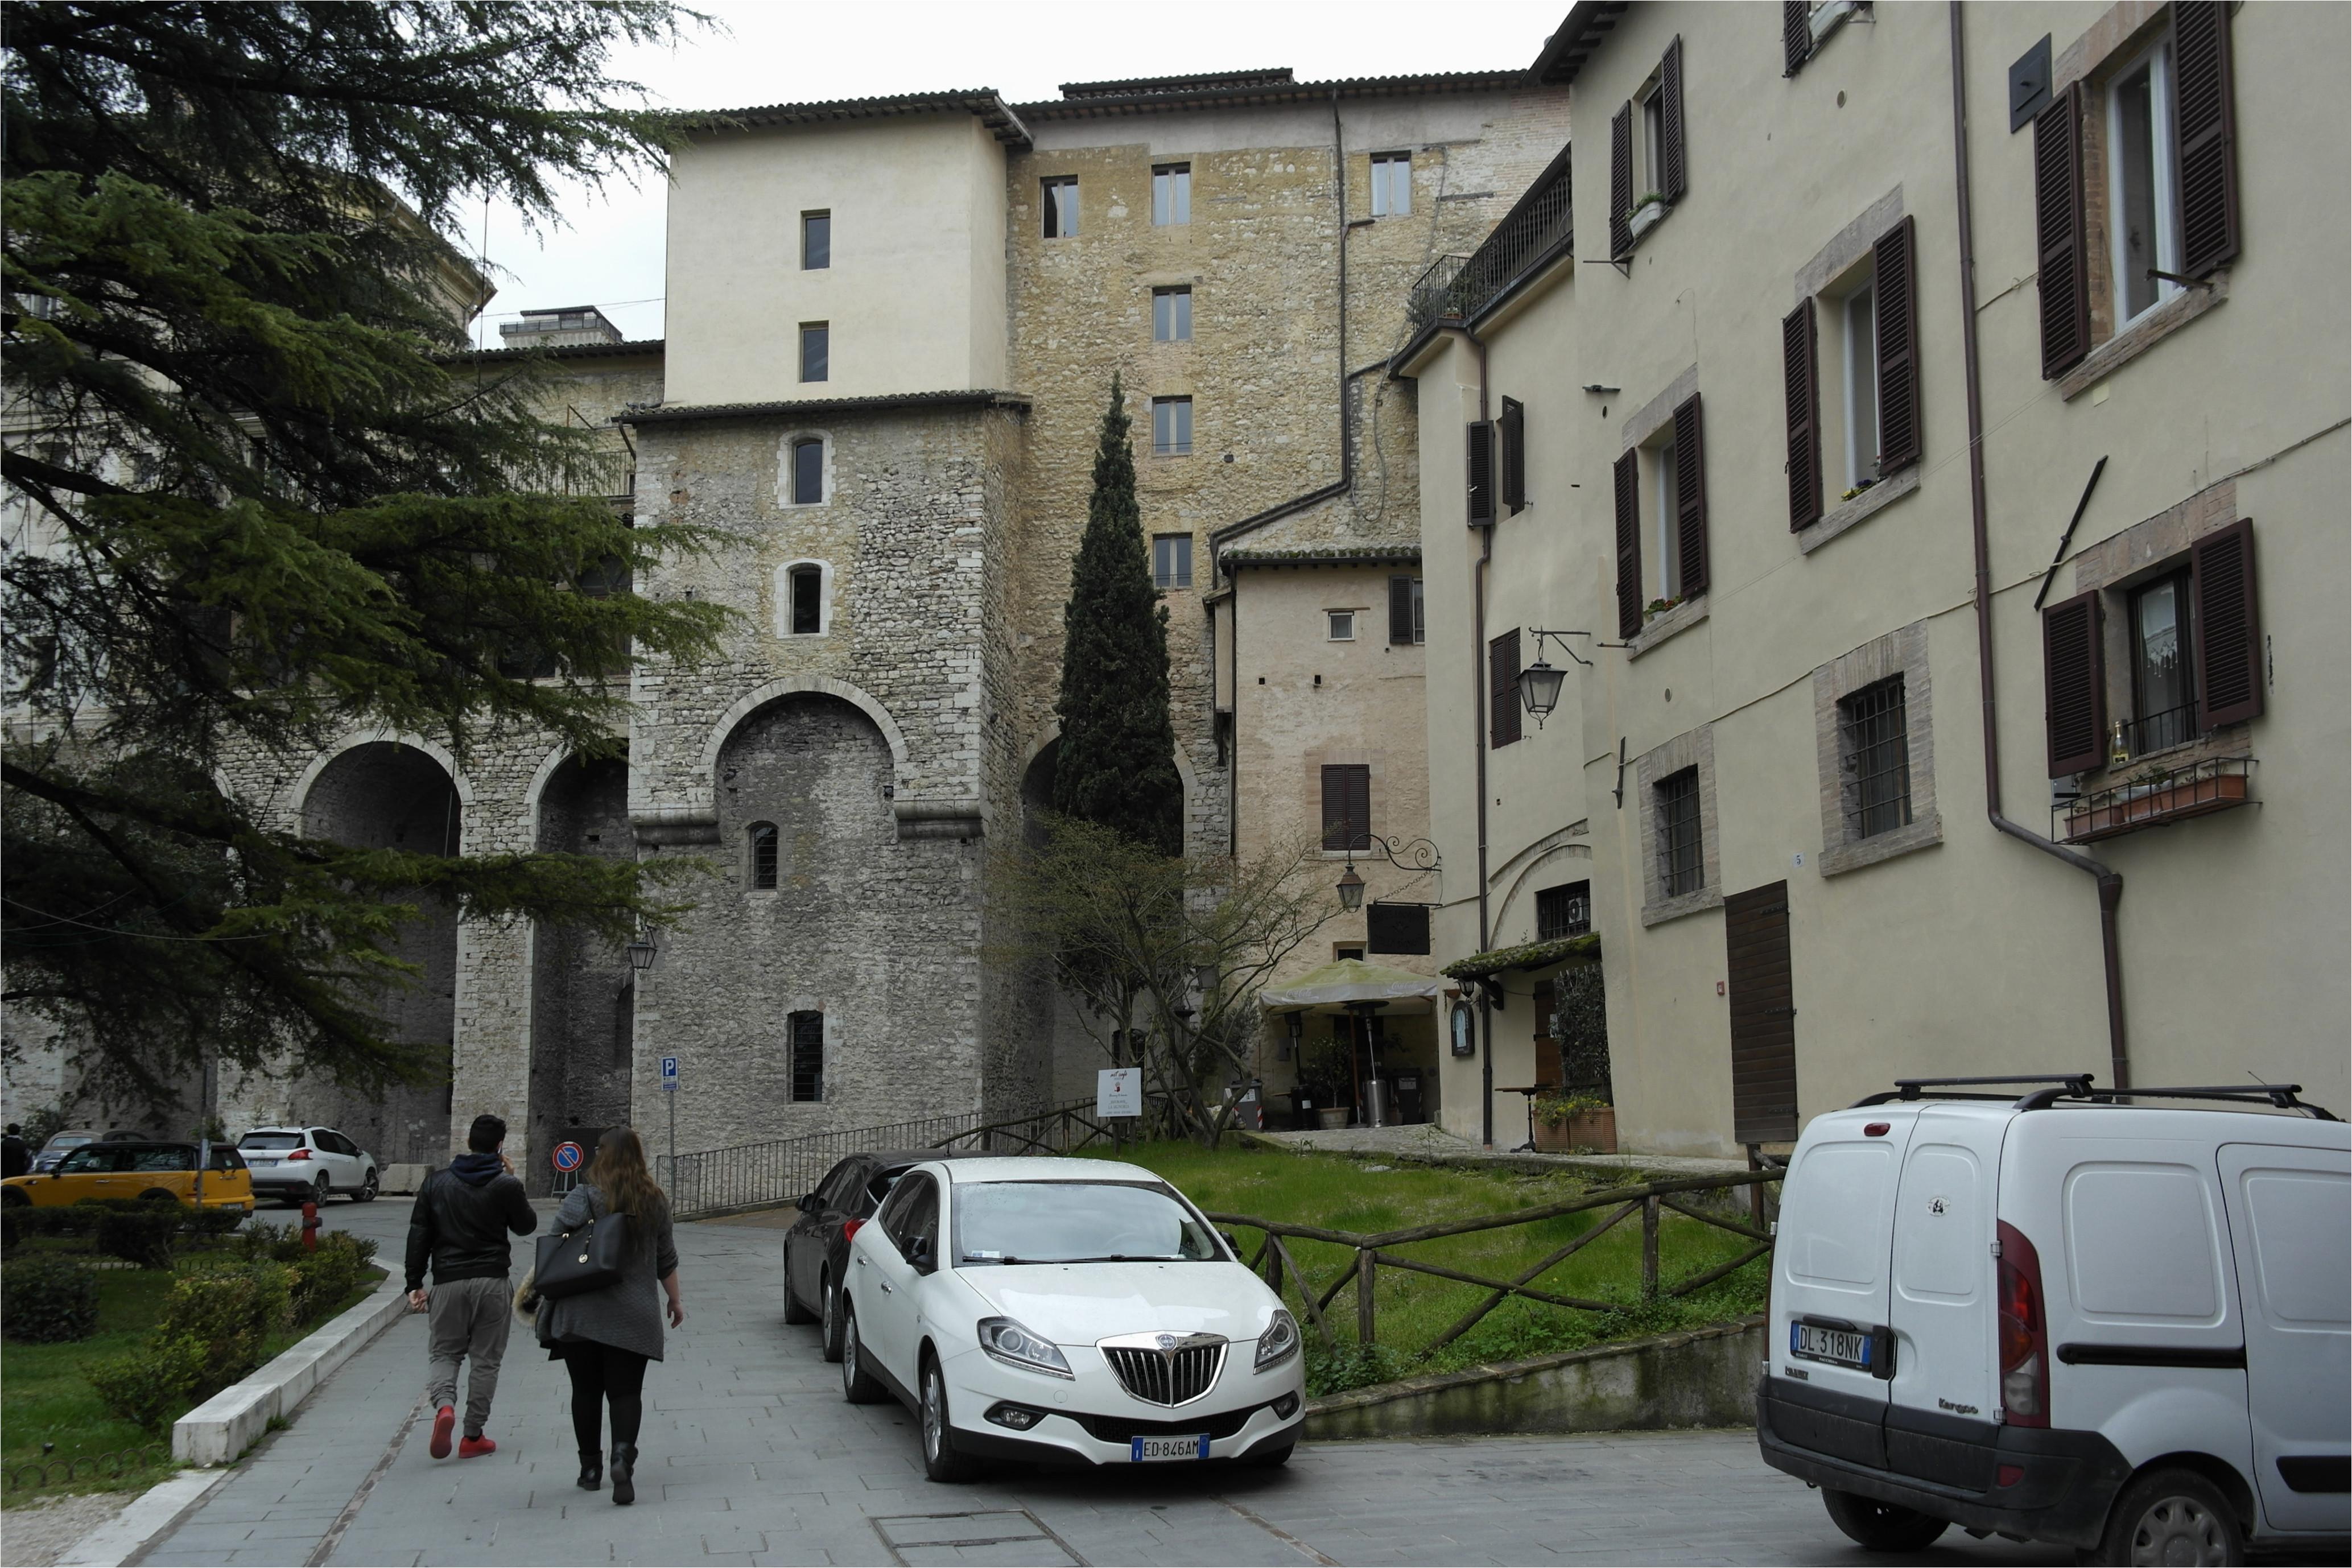 file 06049 spoleto province of perugia italy panoramio 16 jpg